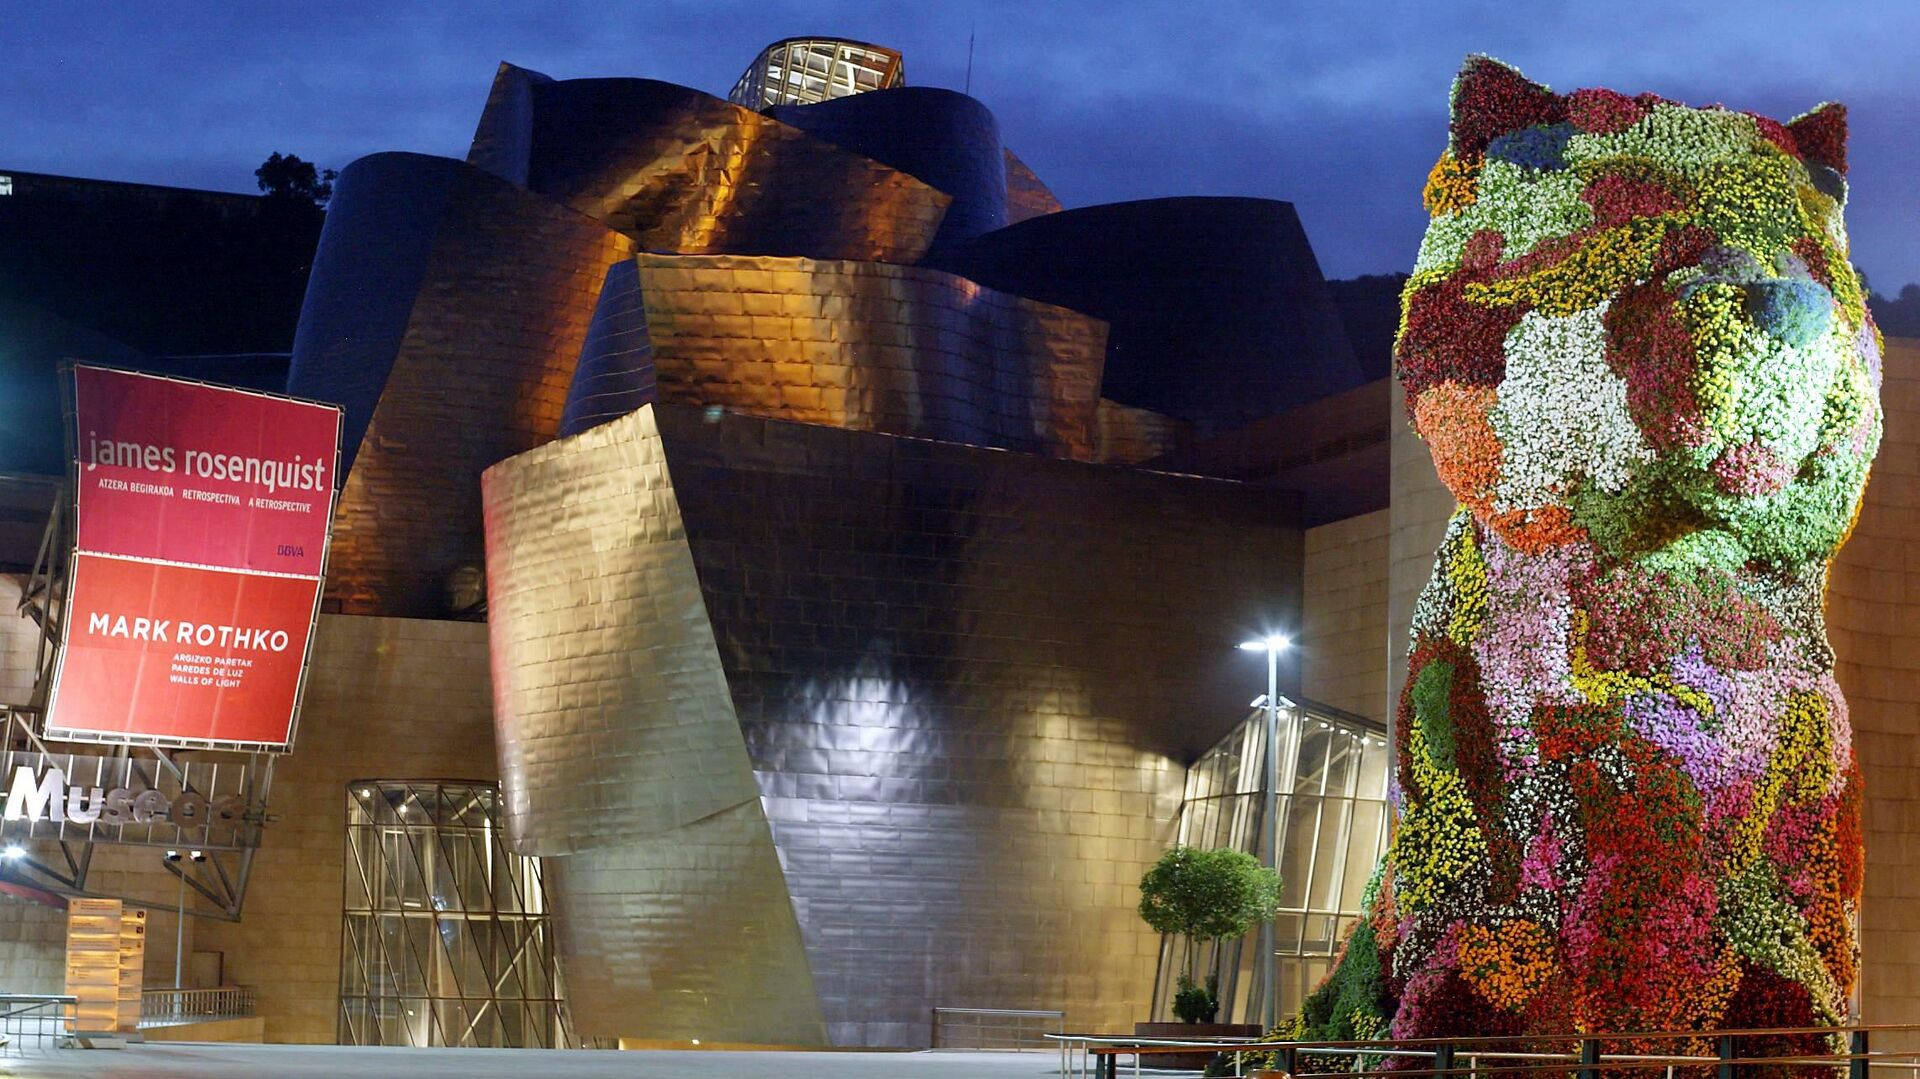 Puppy frente al Museo Guggenheim (Bilbao) - Sputnik Mundo, 1920, 25.06.2021